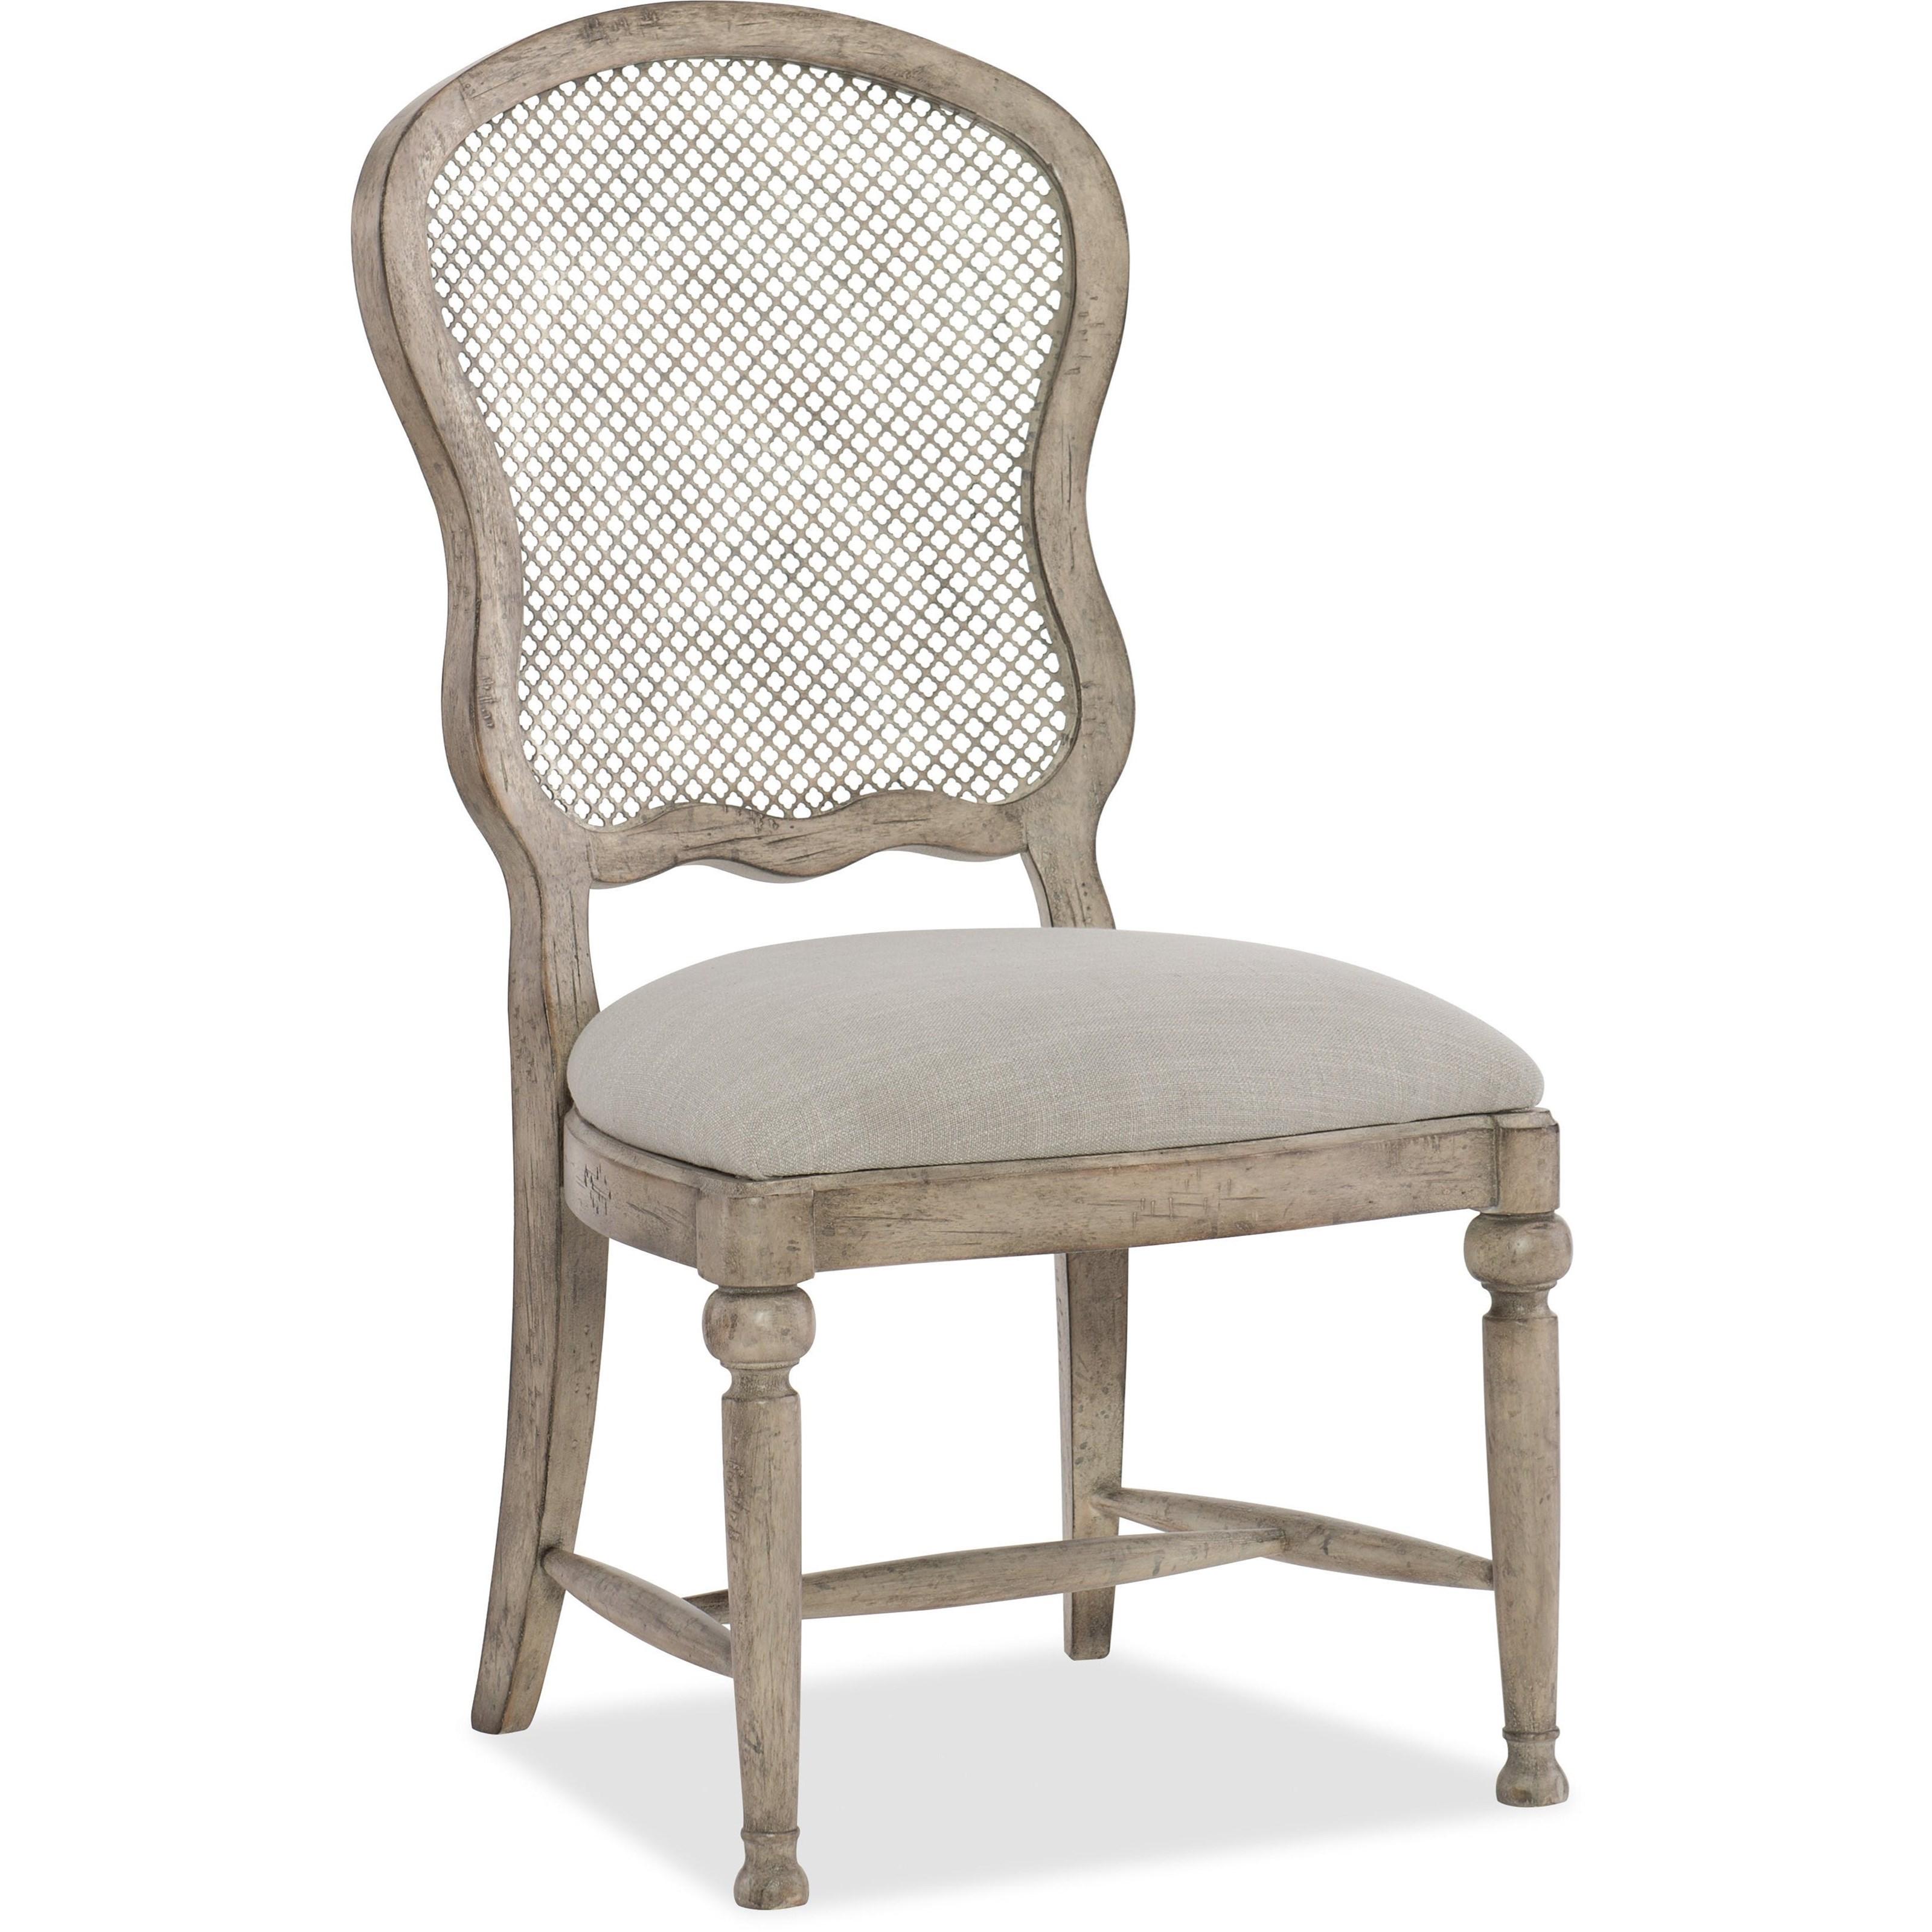 Boheme Gaston Metal Back Side Chair by Hooker Furniture at Miller Waldrop Furniture and Decor